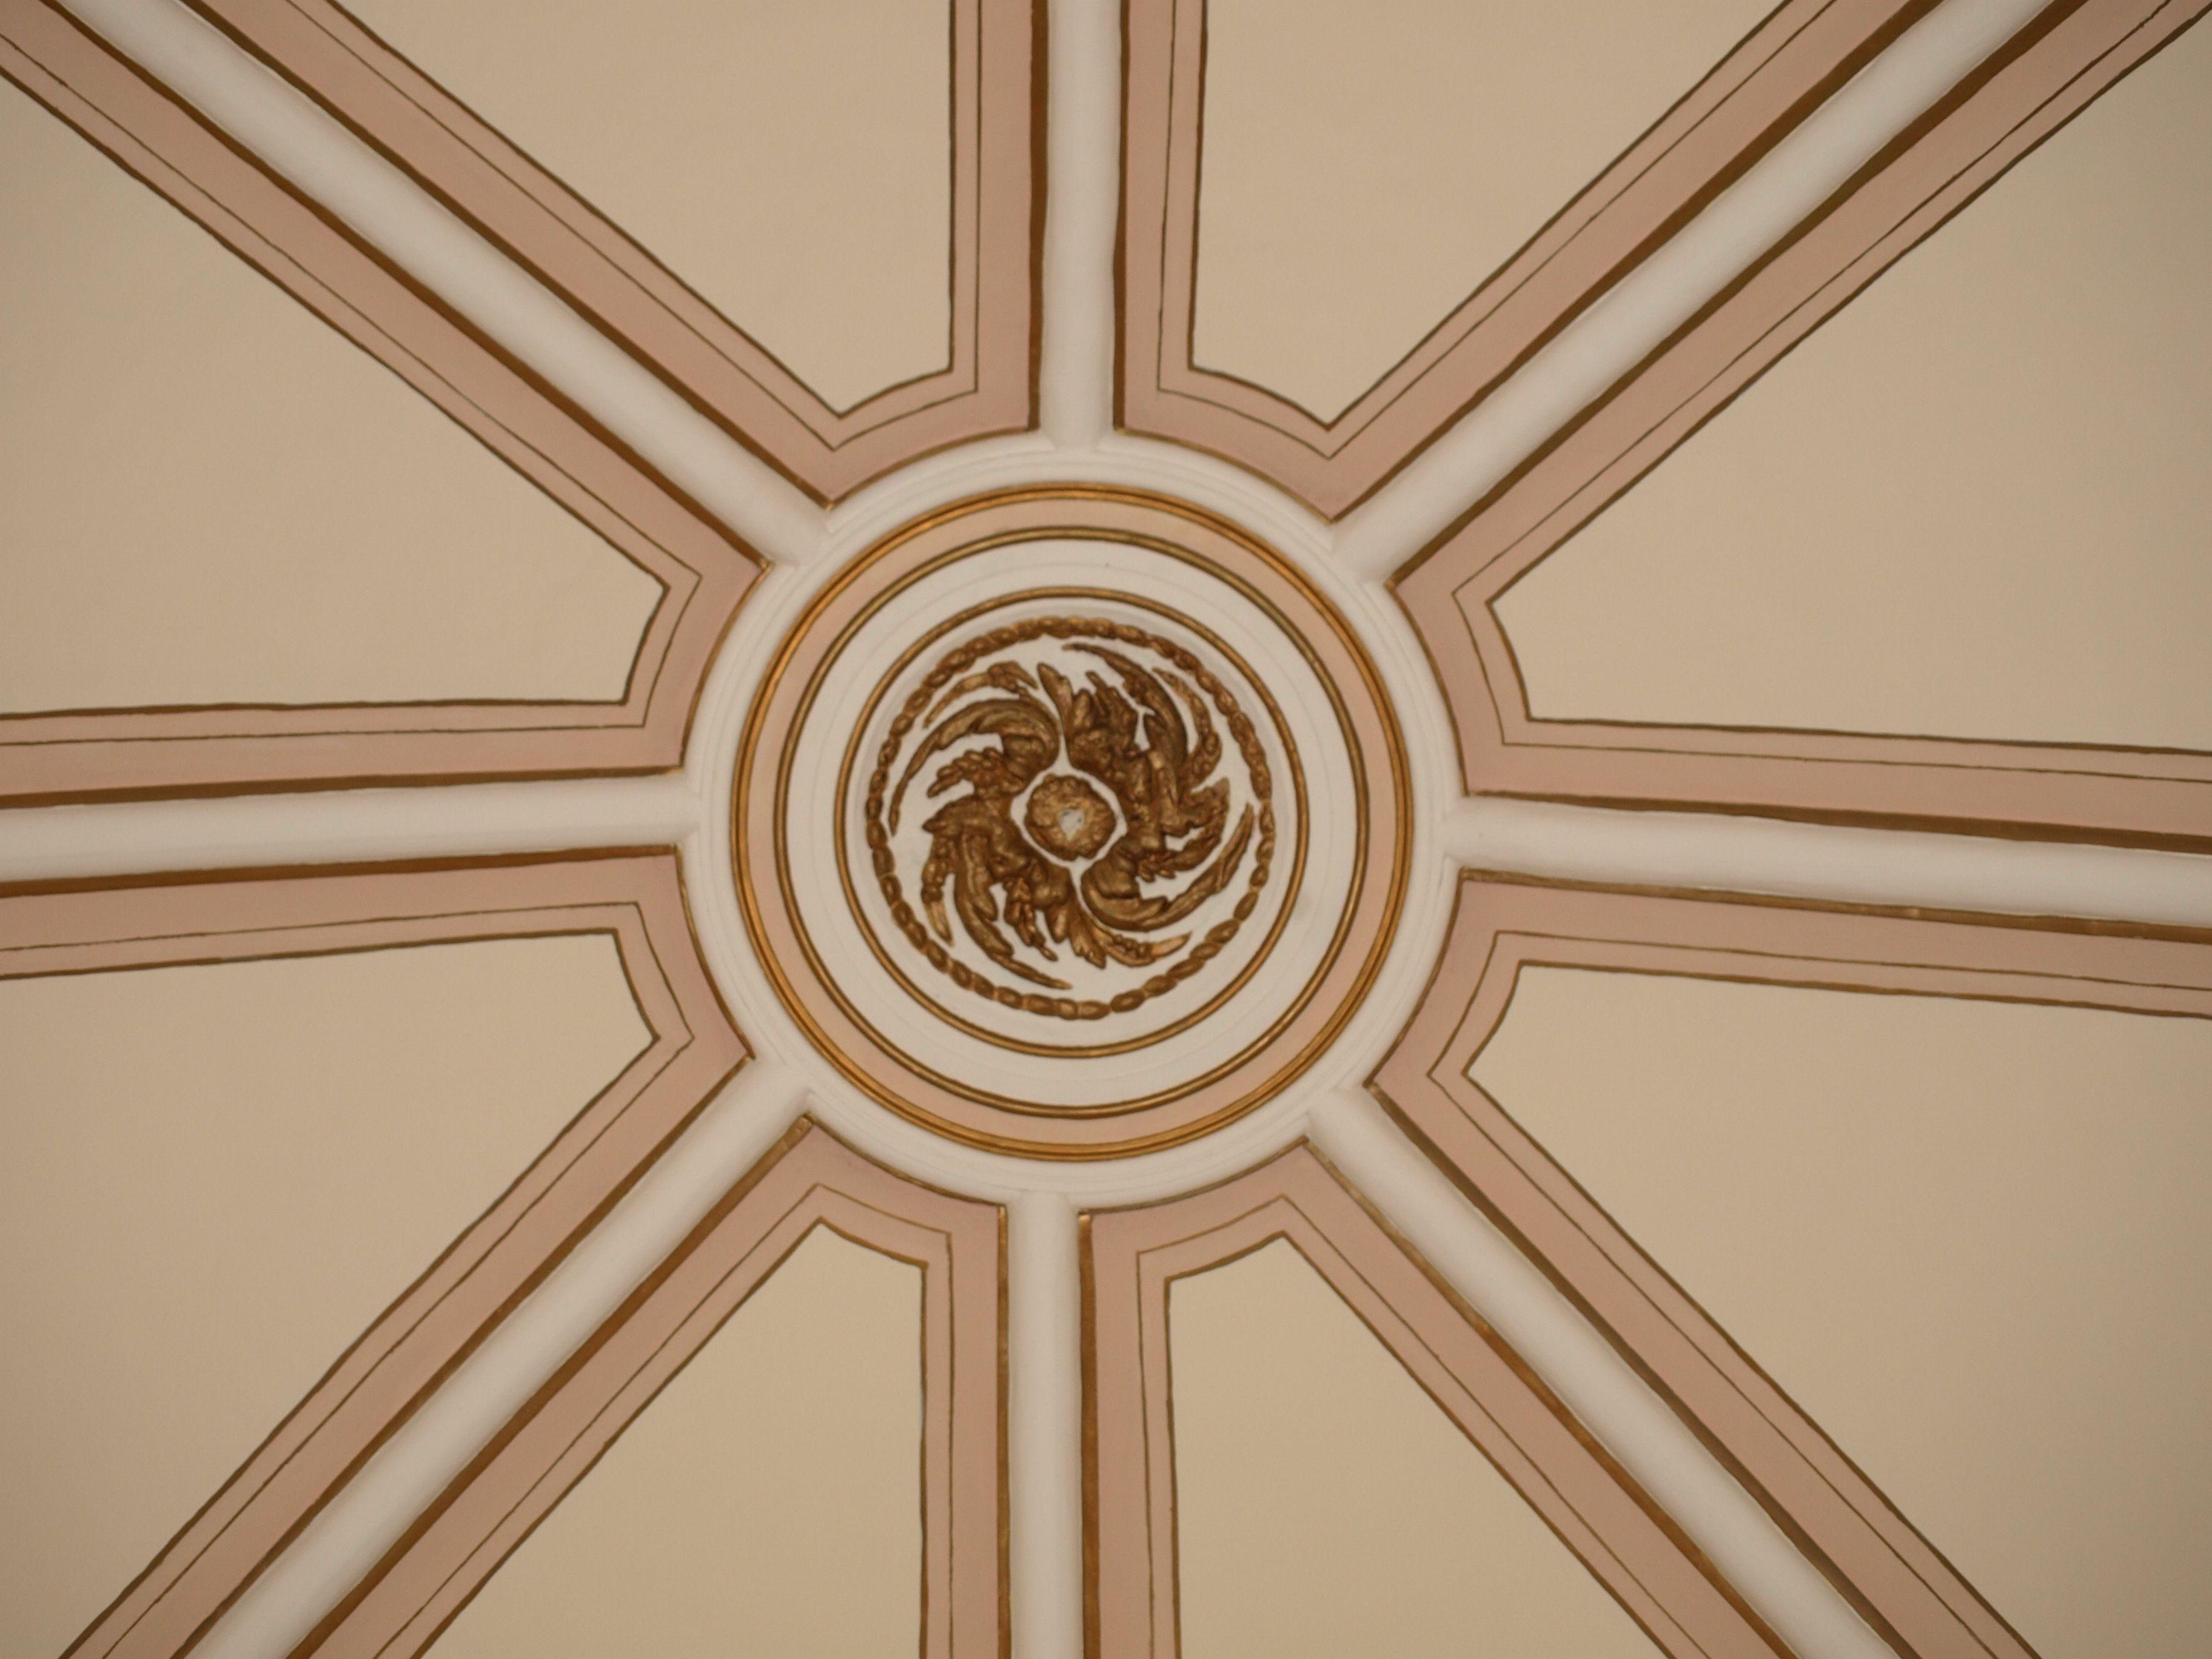 detalle de la cúpula de la ermita de San Miguel